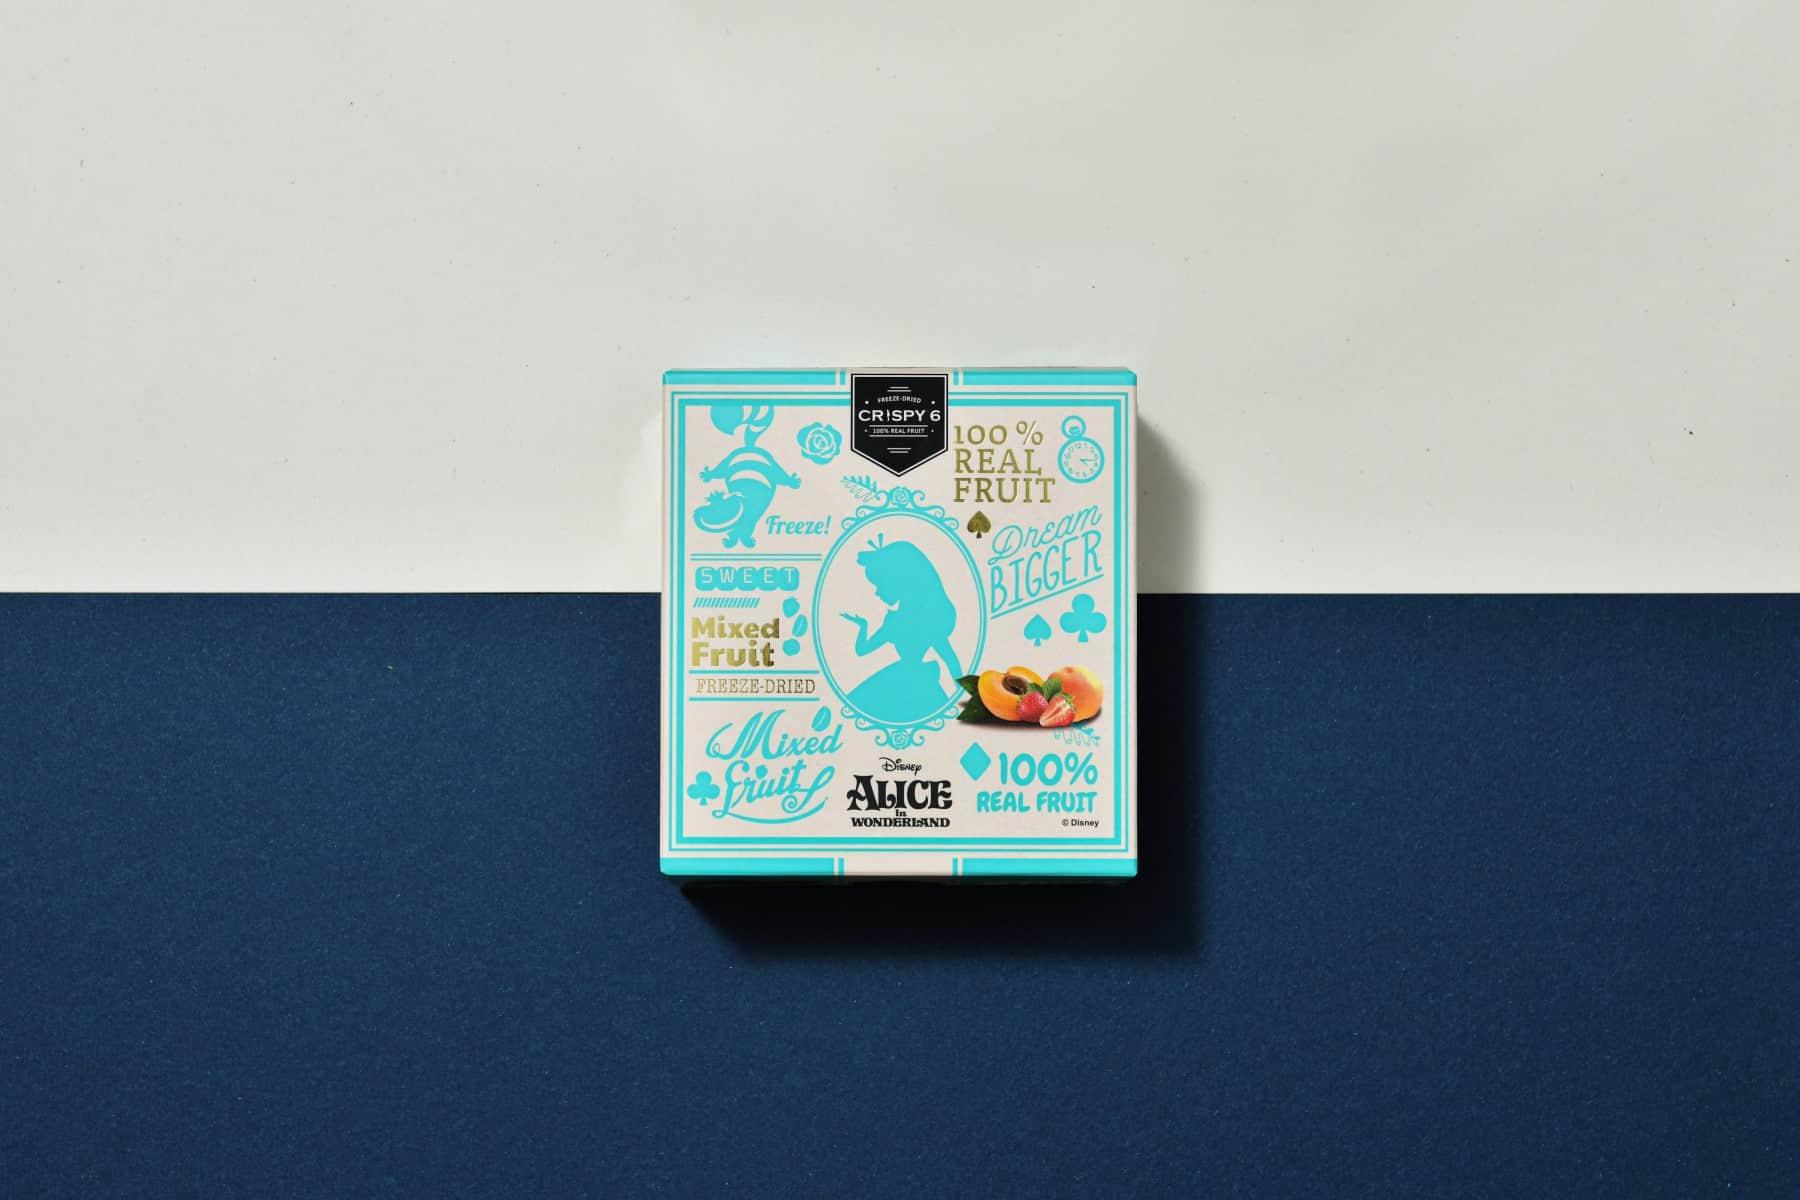 CRISPY 6 凍乾水果包裝設計